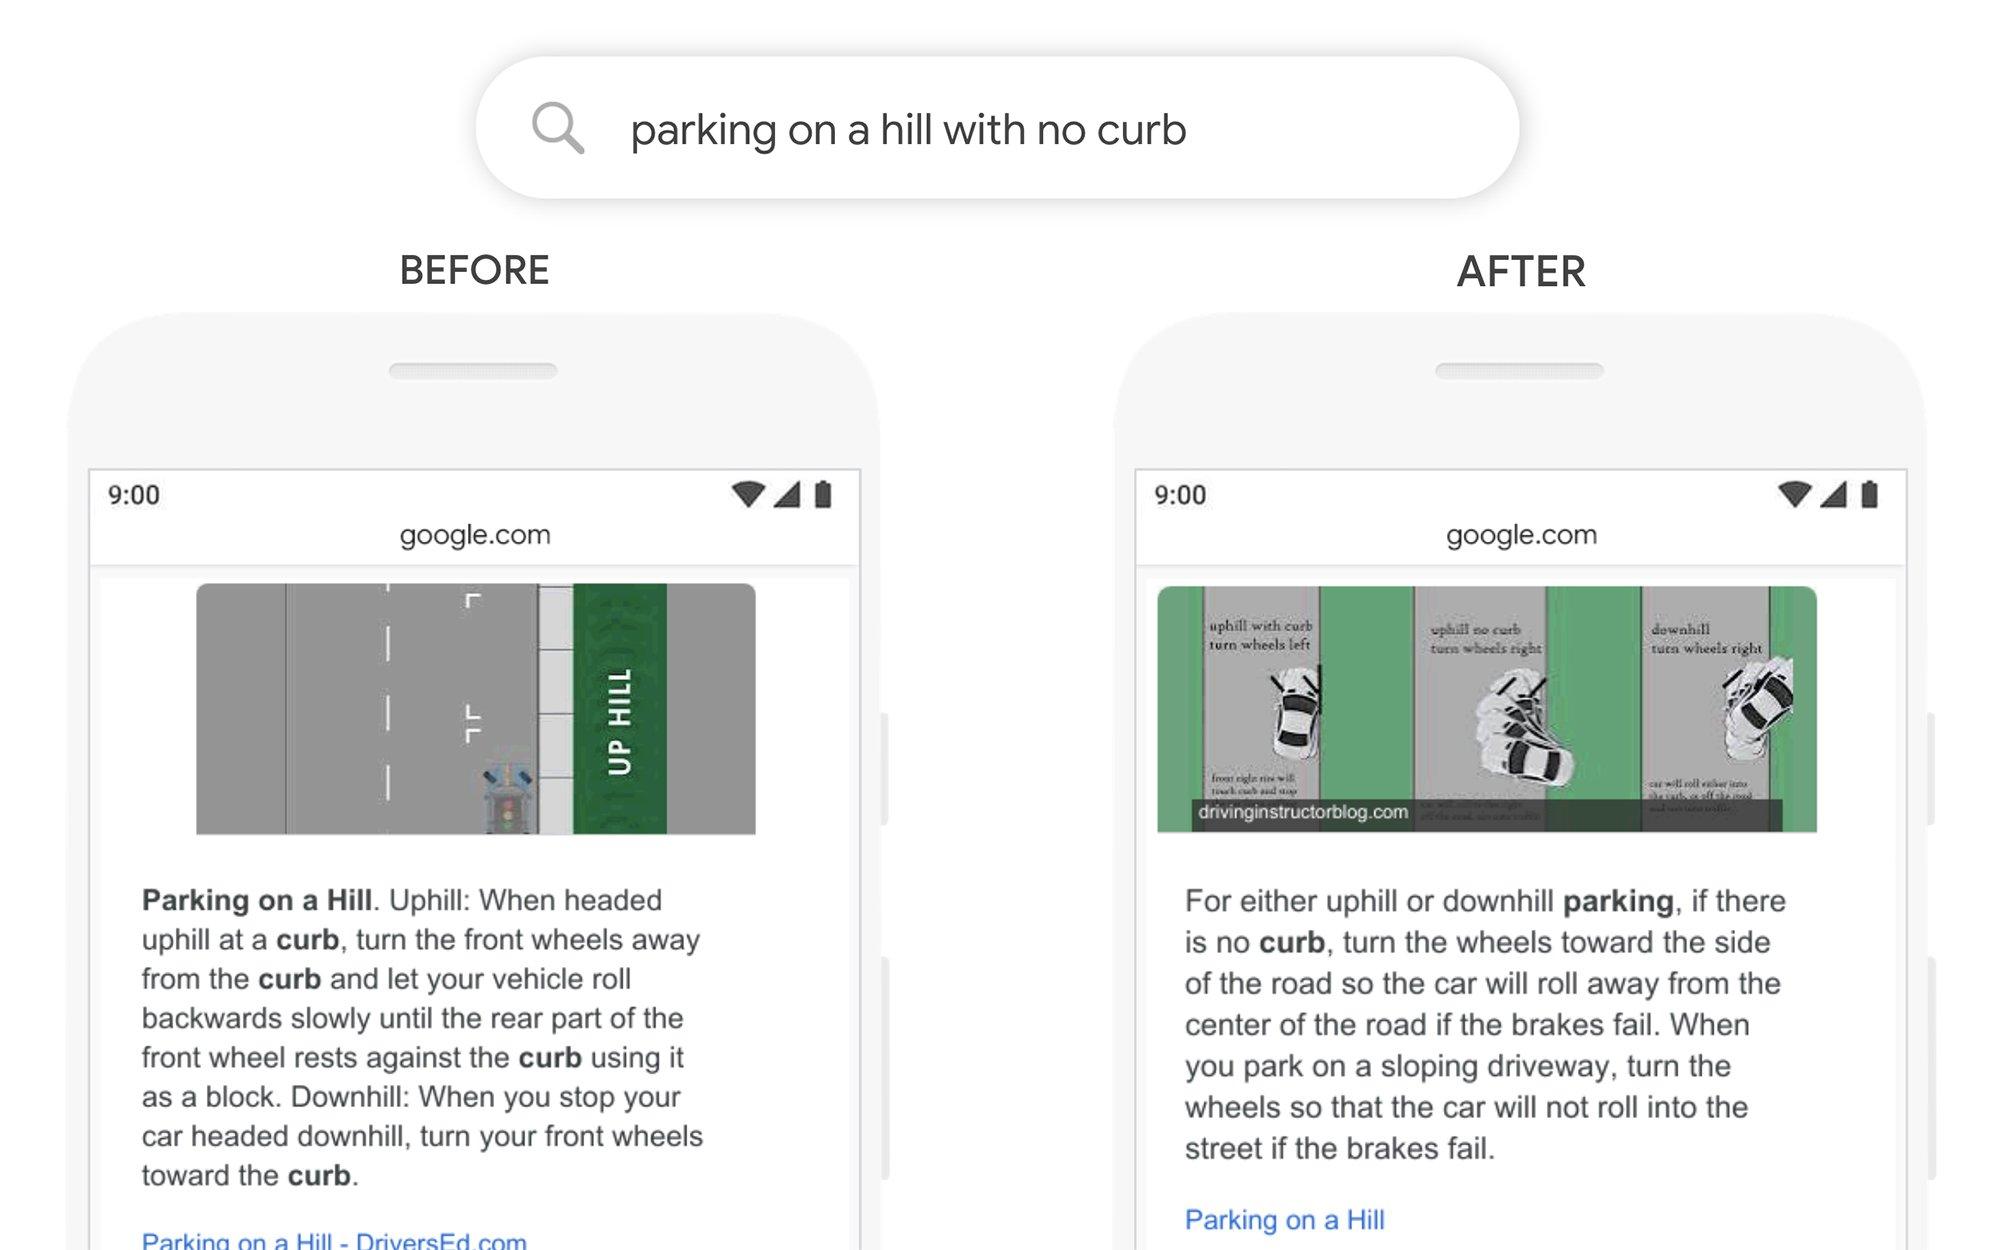 Google BERT 演算法更新 - 讓搜尋引擎更了解搜尋語意 1